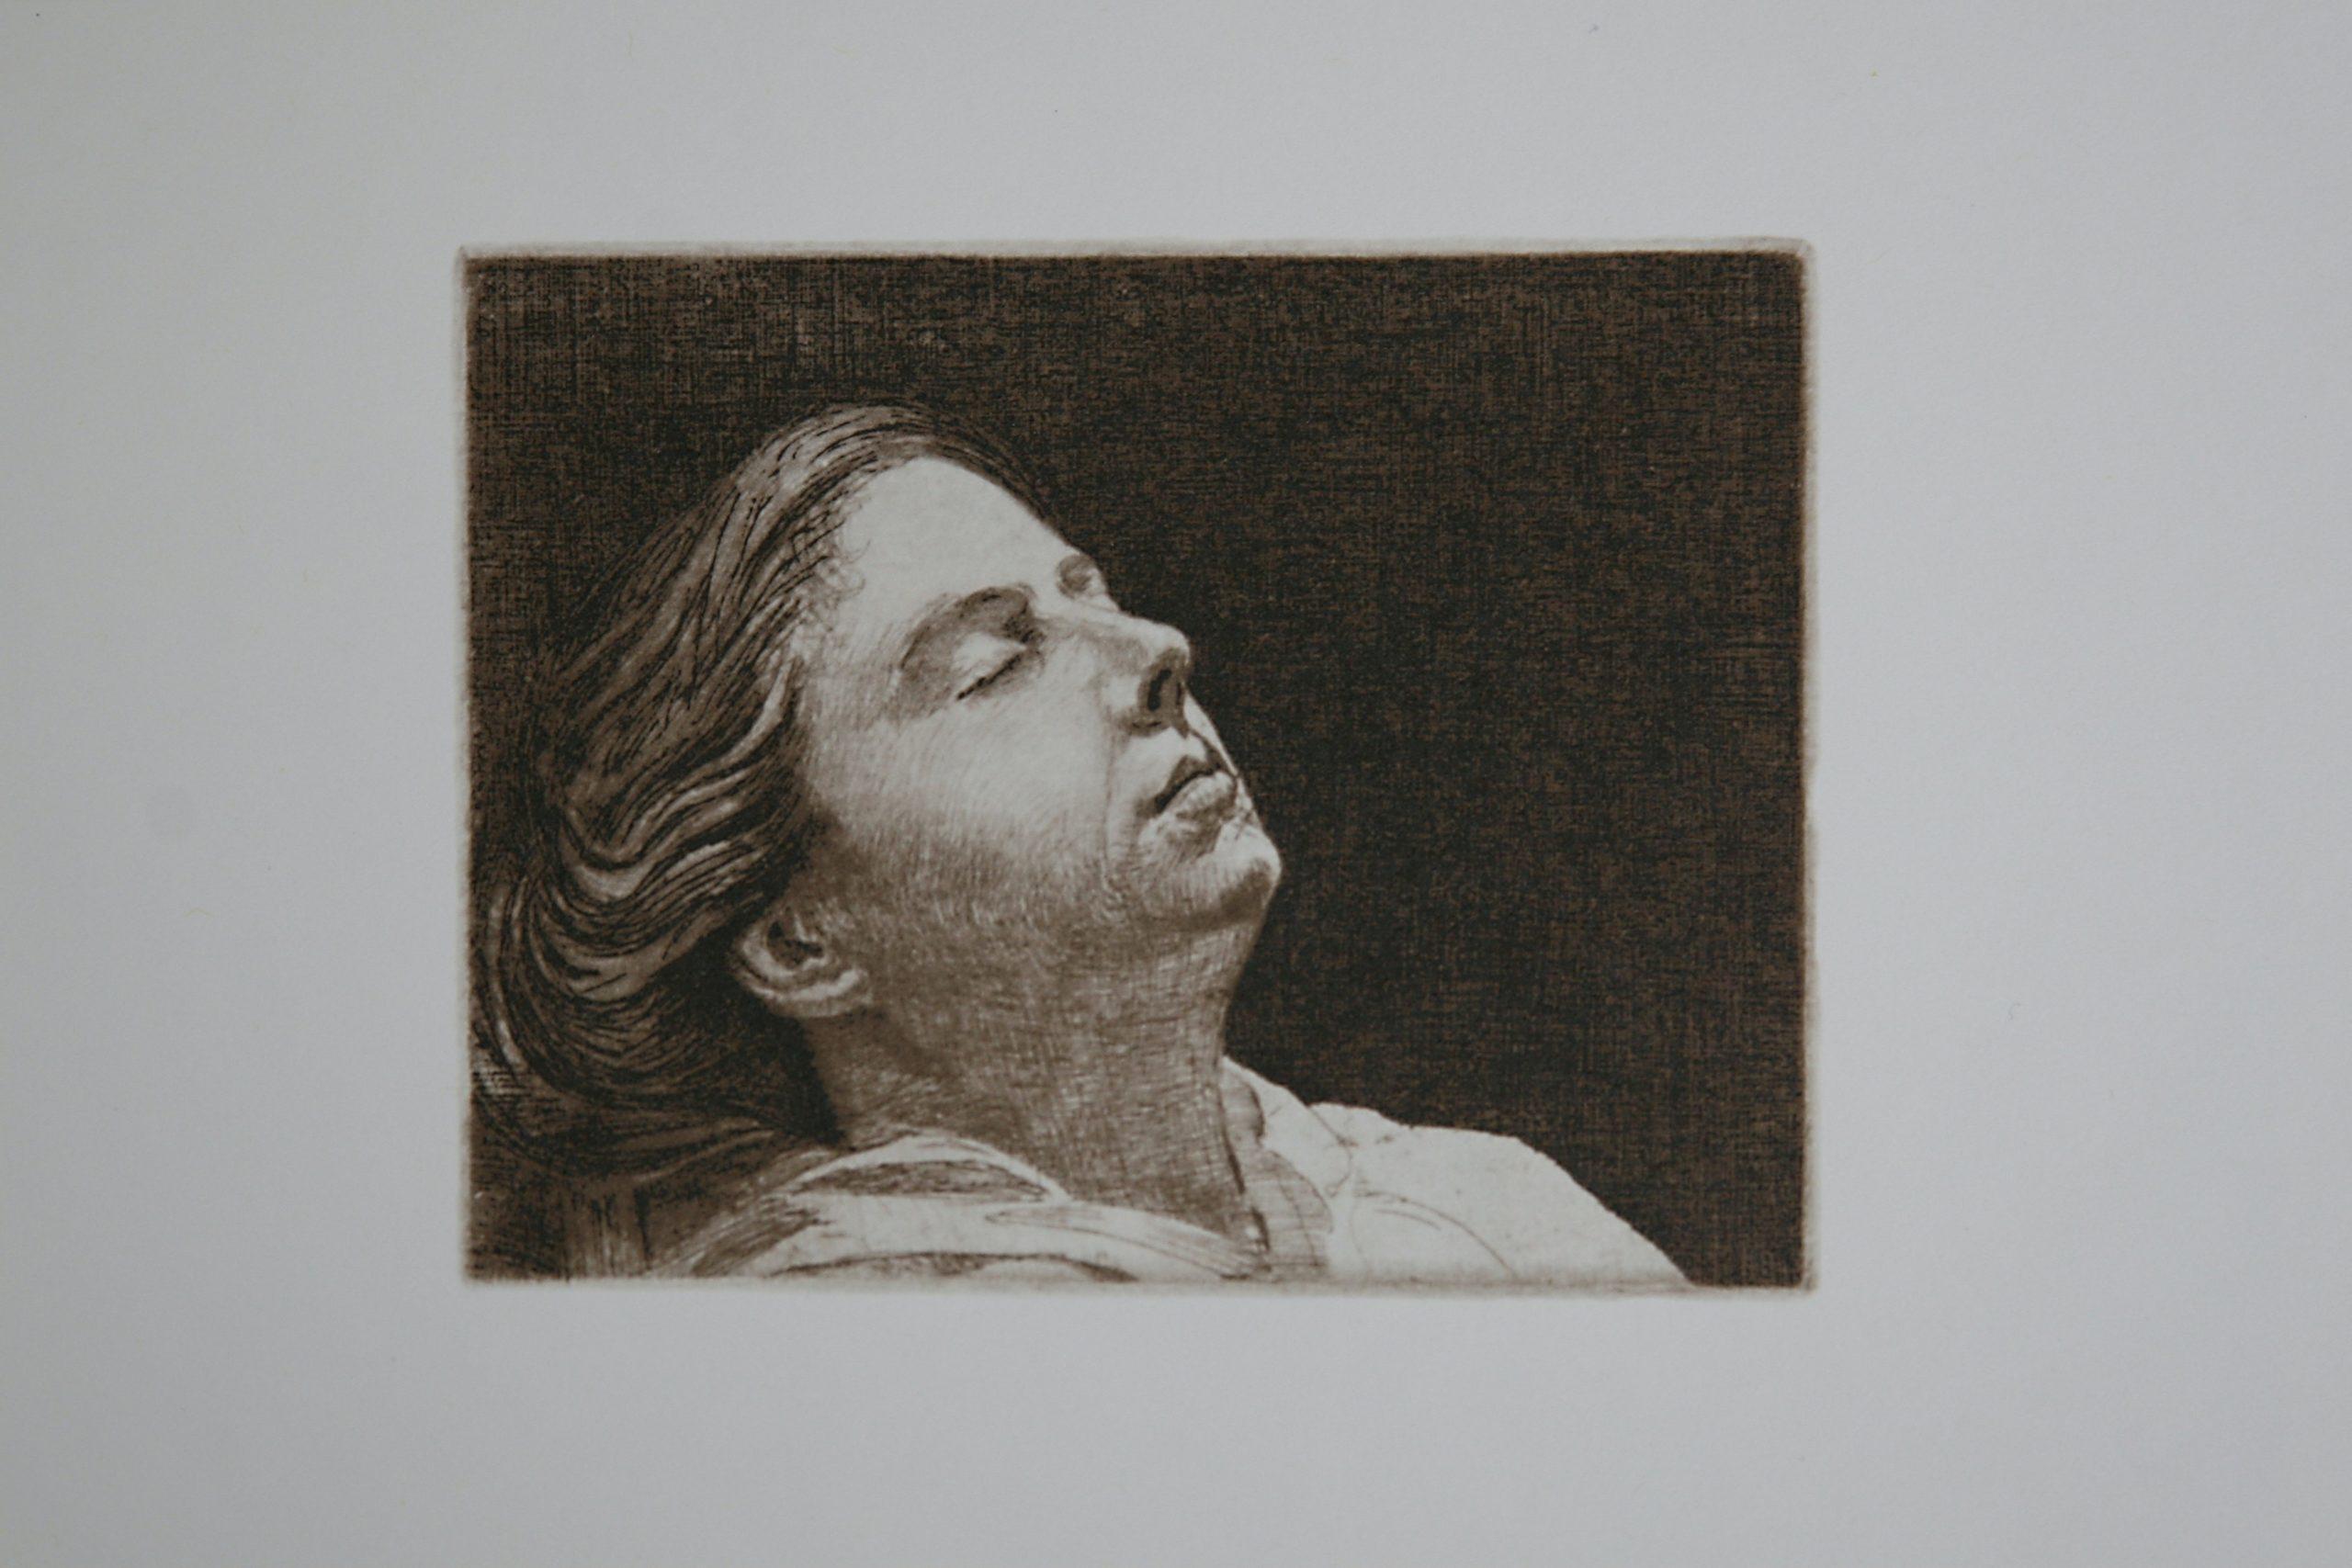 Sleep (Mrs. W.J. Phillips) by WJ Phillips